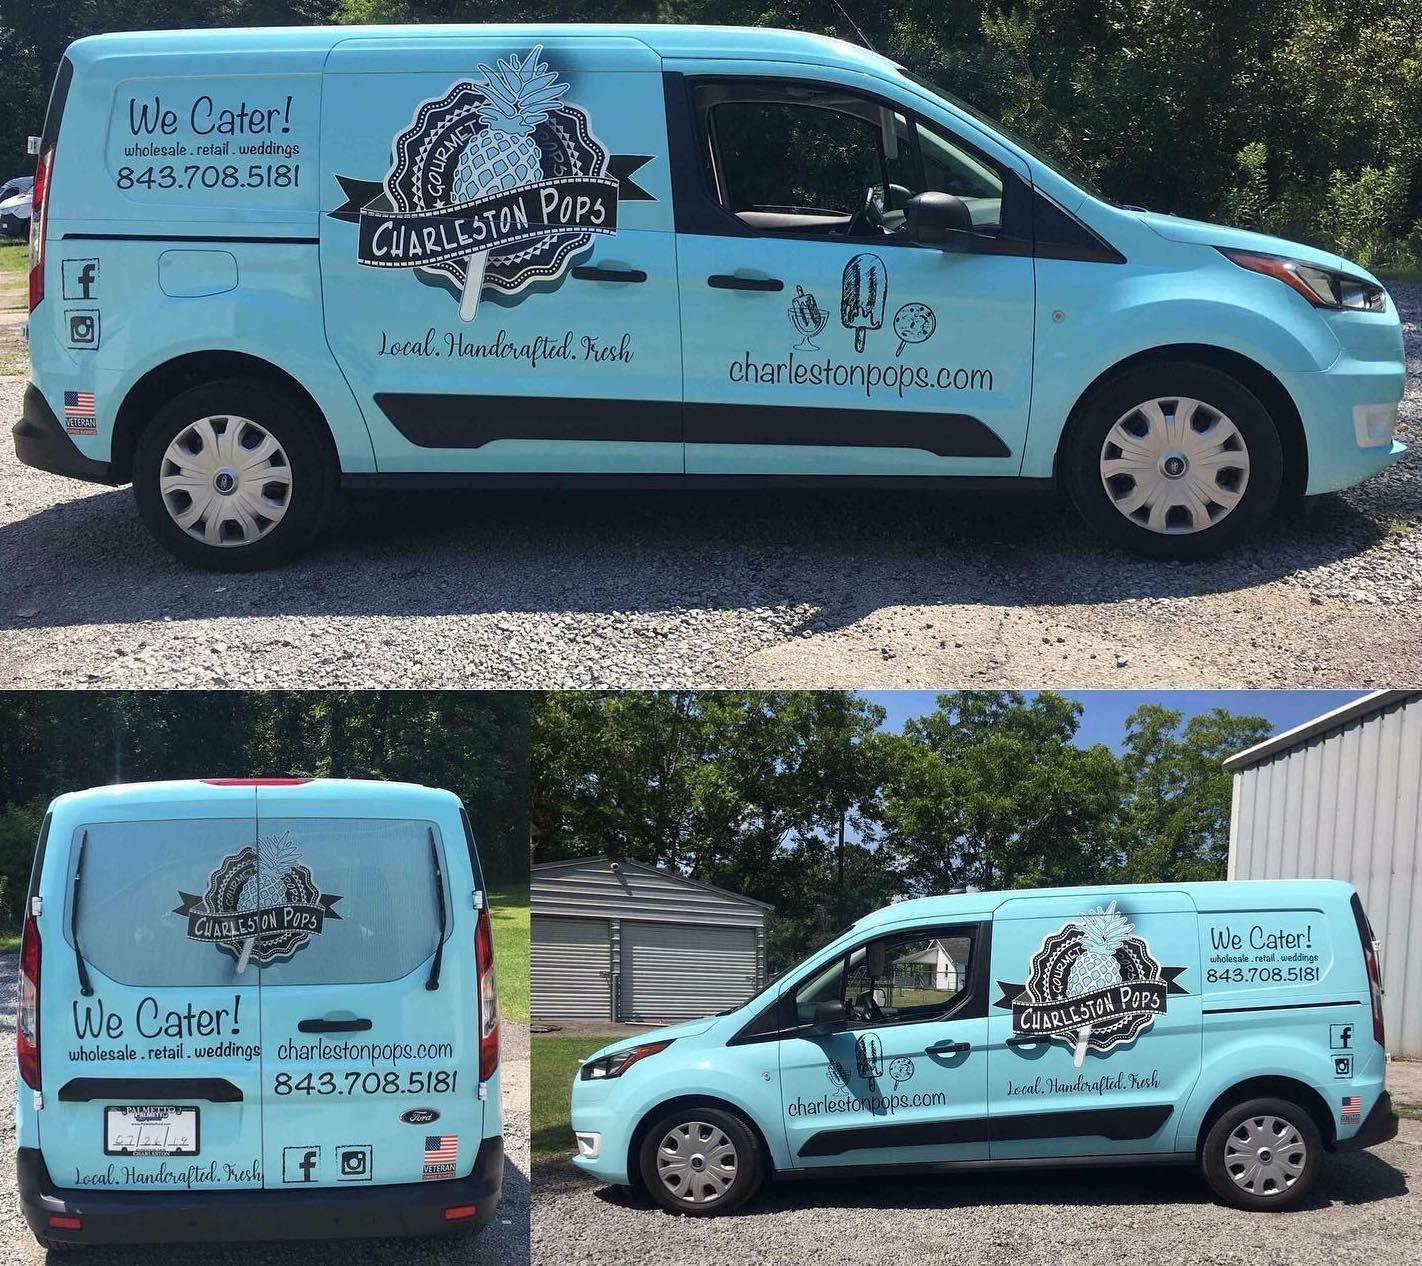 Charleston Wraps Charleston Pops Full Van Vinyl Wrap In 2020 Vinyl Wrap Car Wrap Commercial Vehicle